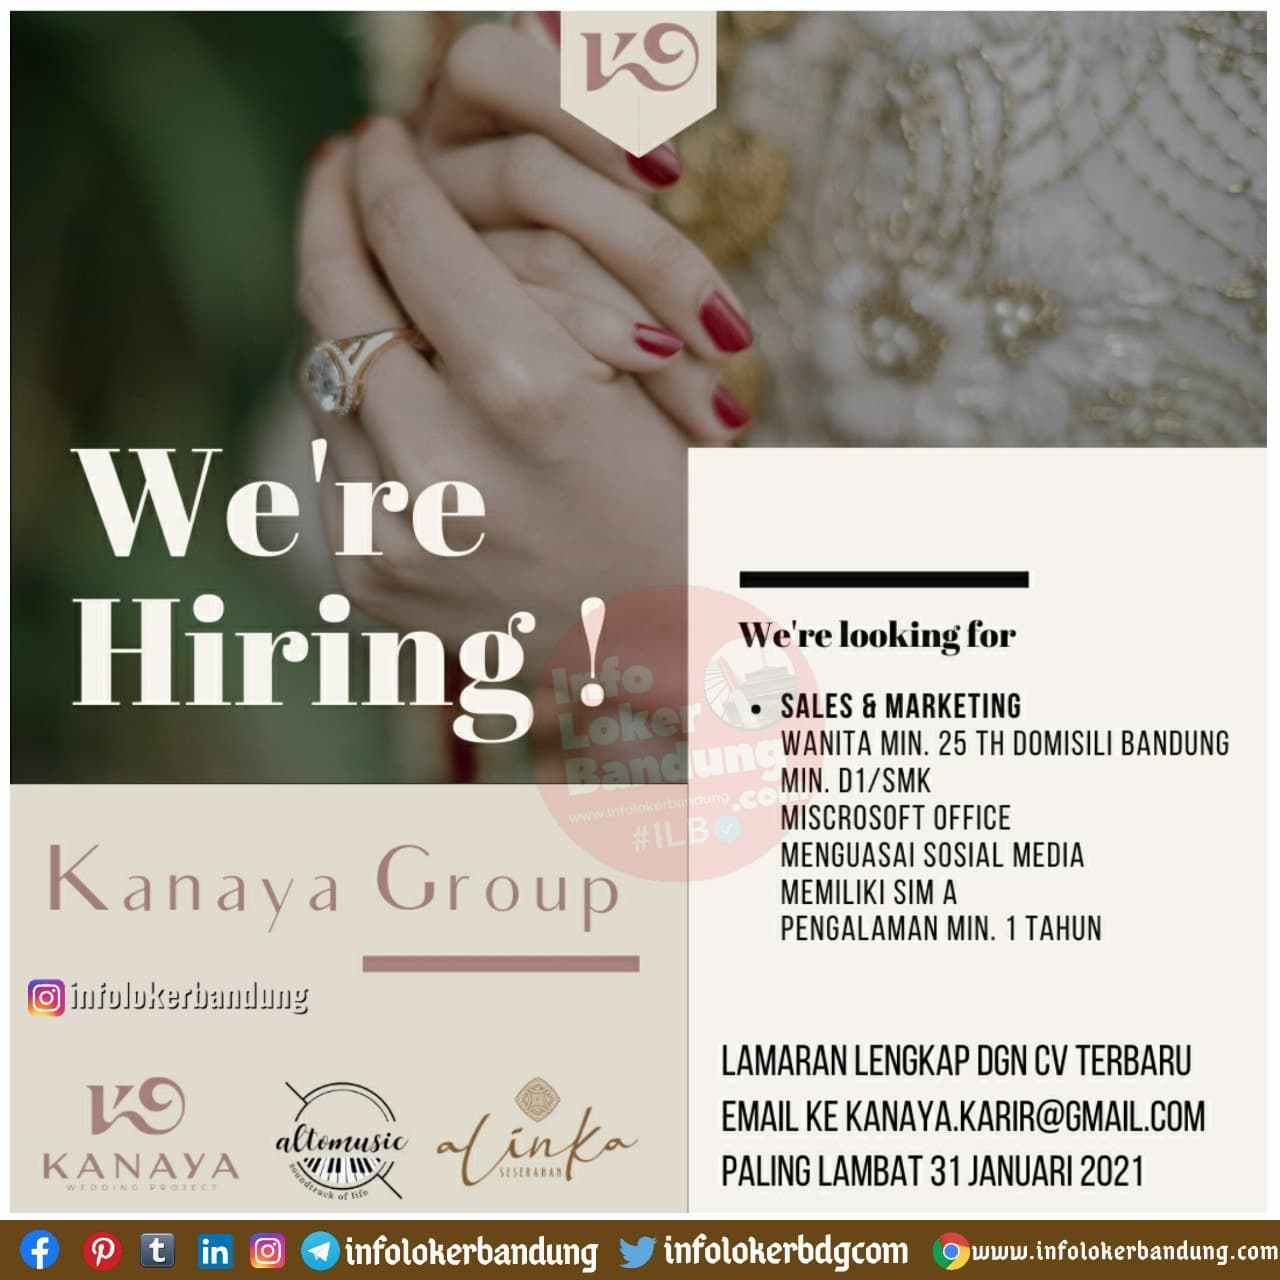 Lowongan Kerja Sales & Marketing Kanaya Group Bandung Januari 2021